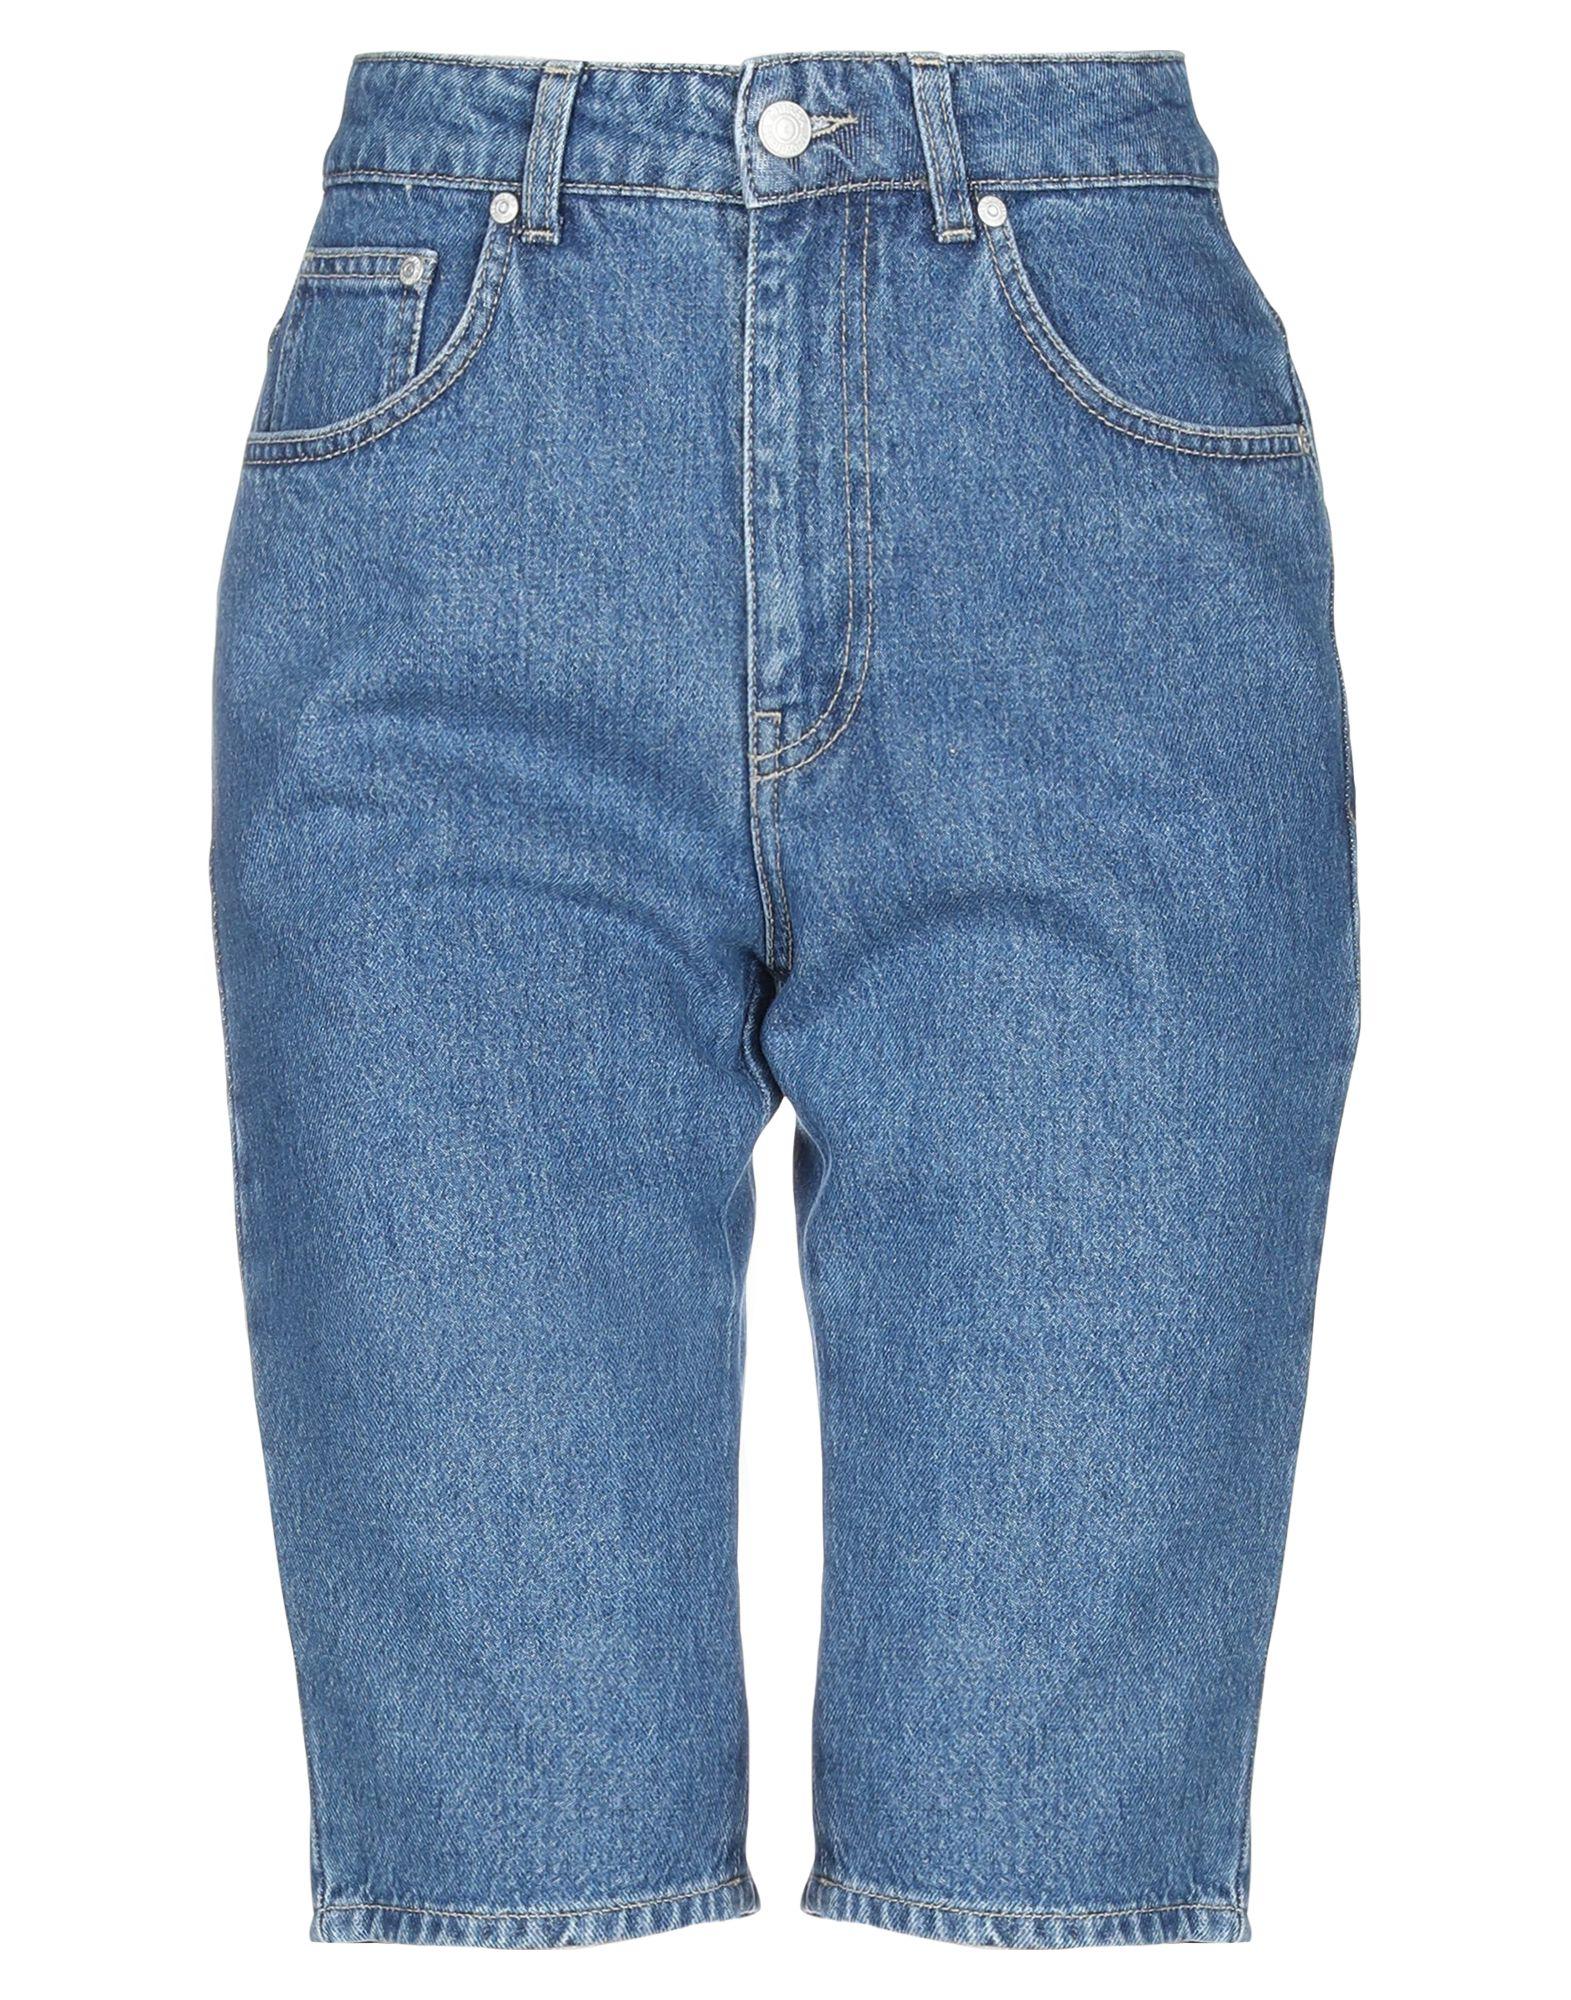 CHIARA FERRAGNI Джинсовые бермуды chiara deste джинсовые брюки page 5